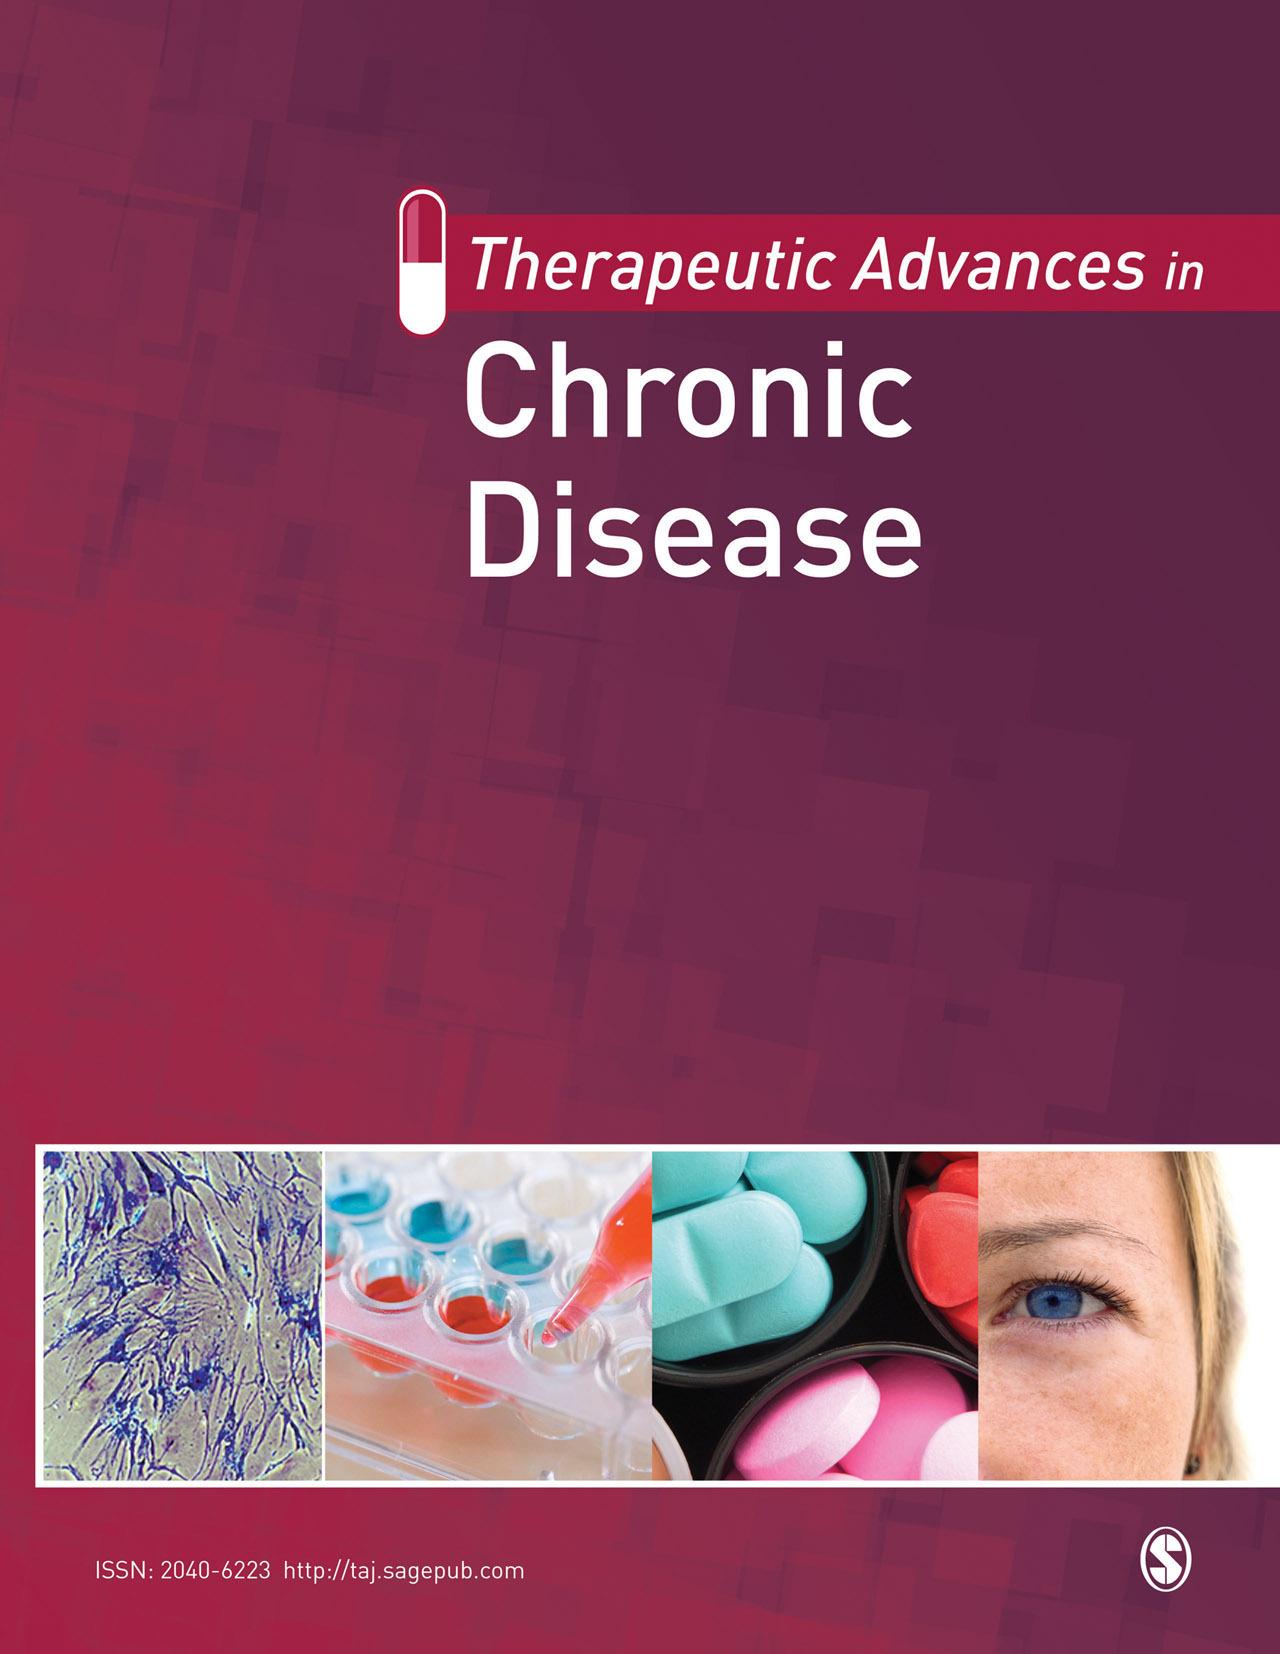 Therapeutic Advances in Chronic Disease